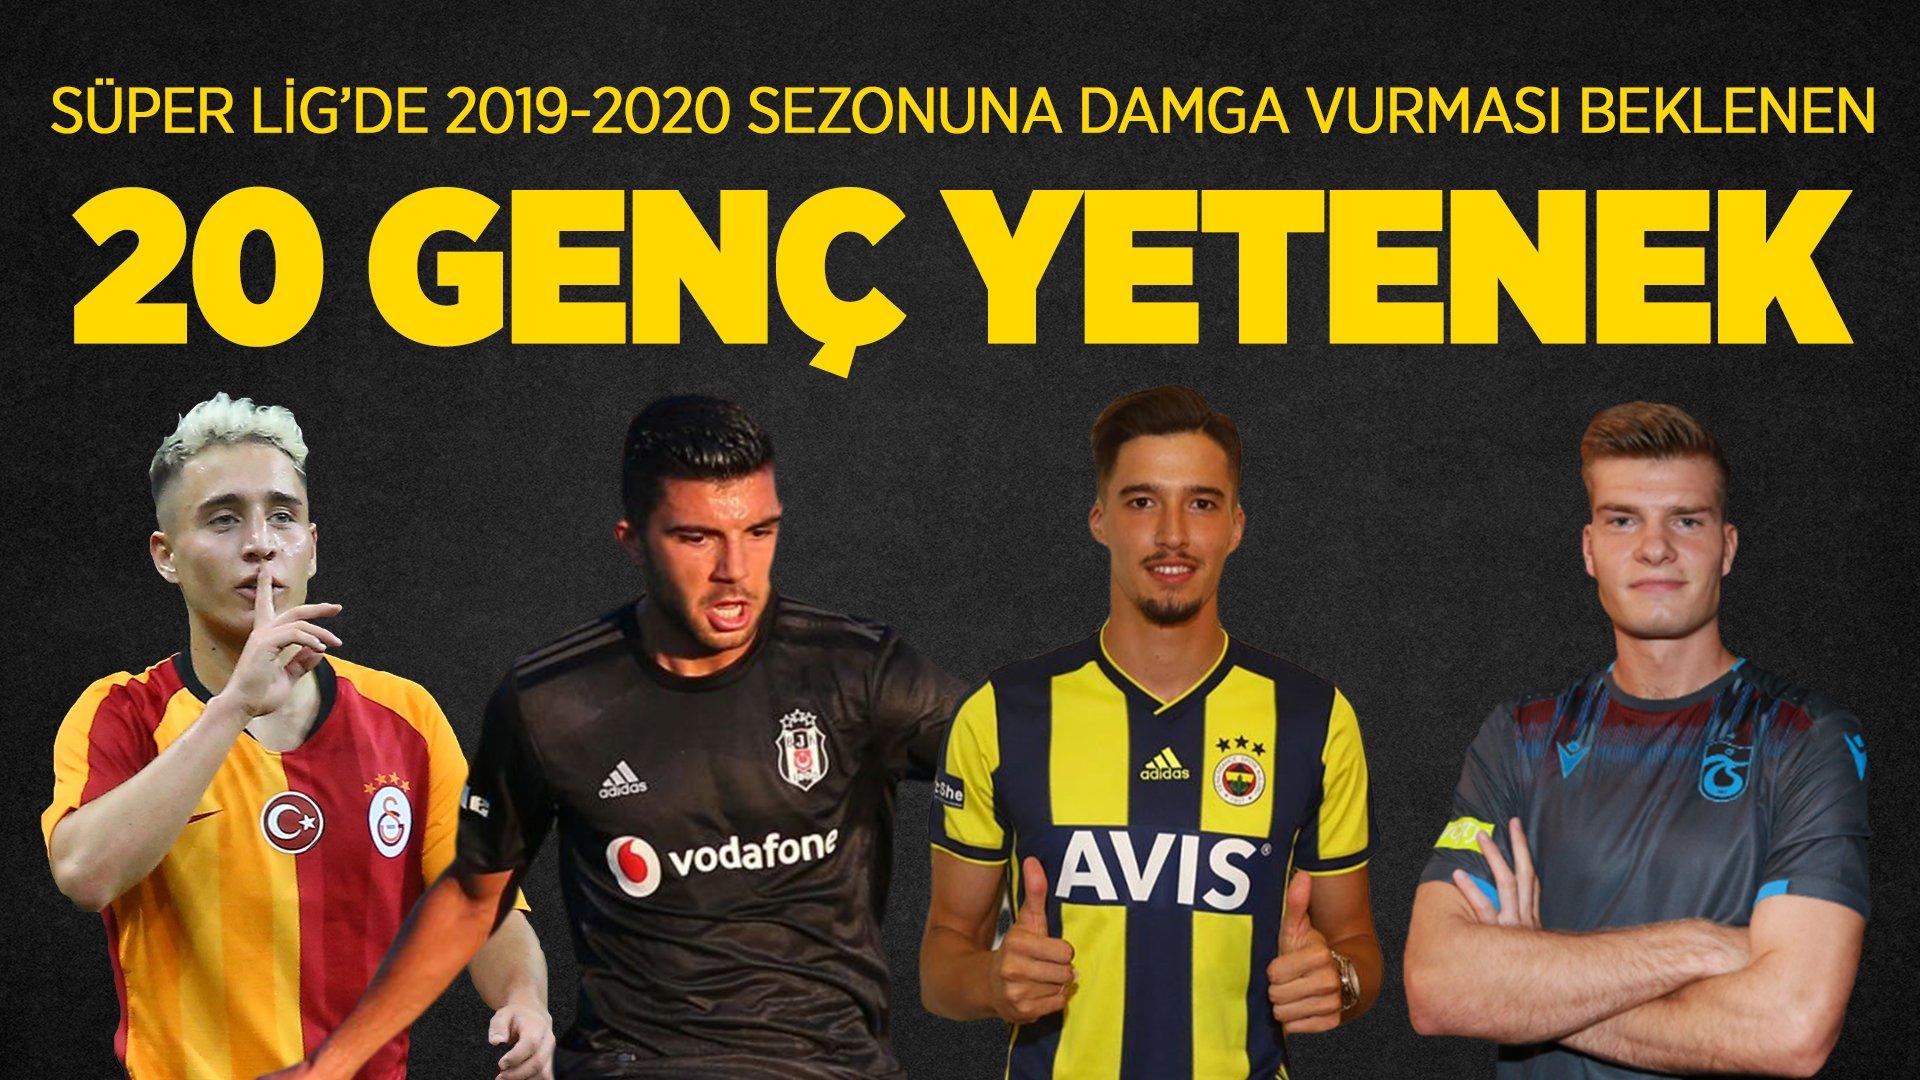 'Süper Lig'e damga vurabilecek 20 genç futbolcu